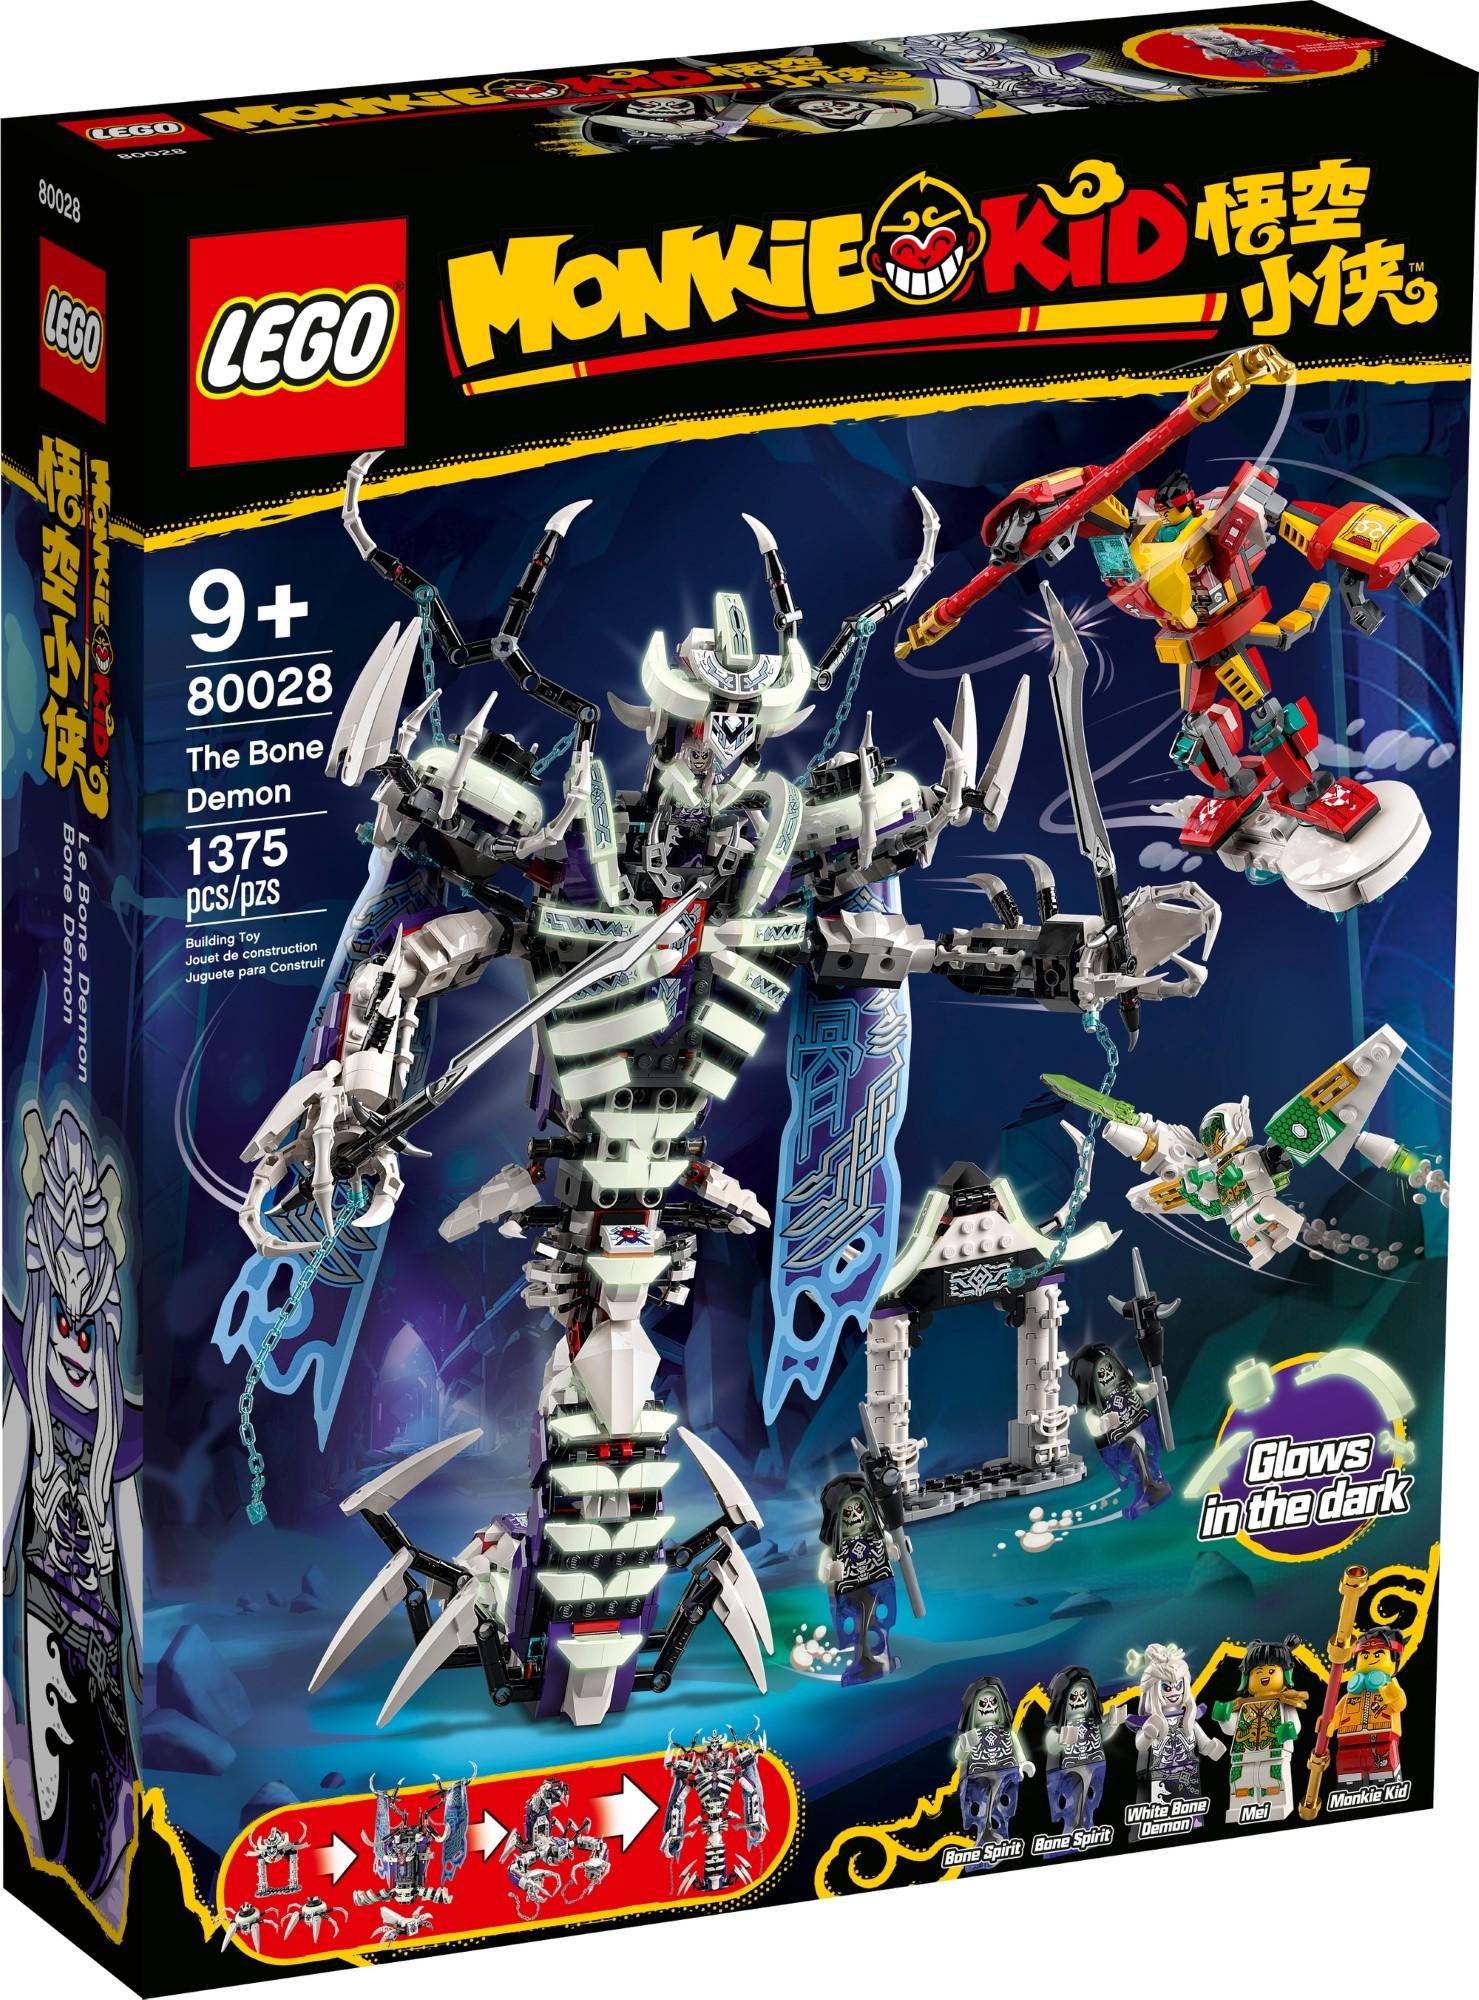 LEGO Monkie Kid 80028 Bone Demon 2